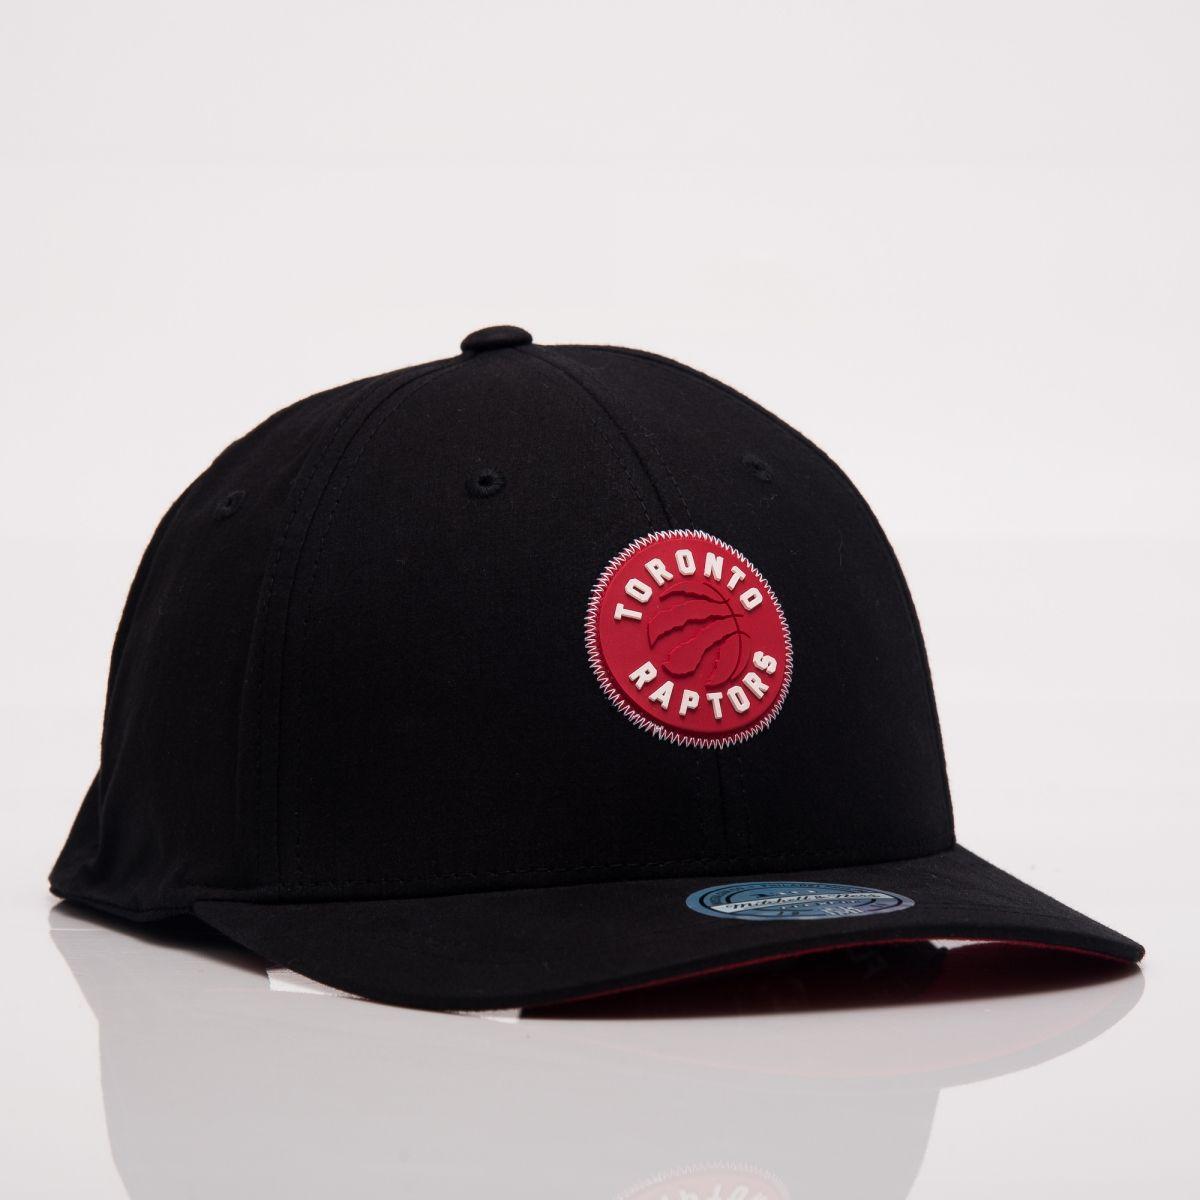 913fd5593b8db8 Type Caps Mitchell & Ness NBA Toronto Raptors Biowashed Zig Zag  Snapback Cap